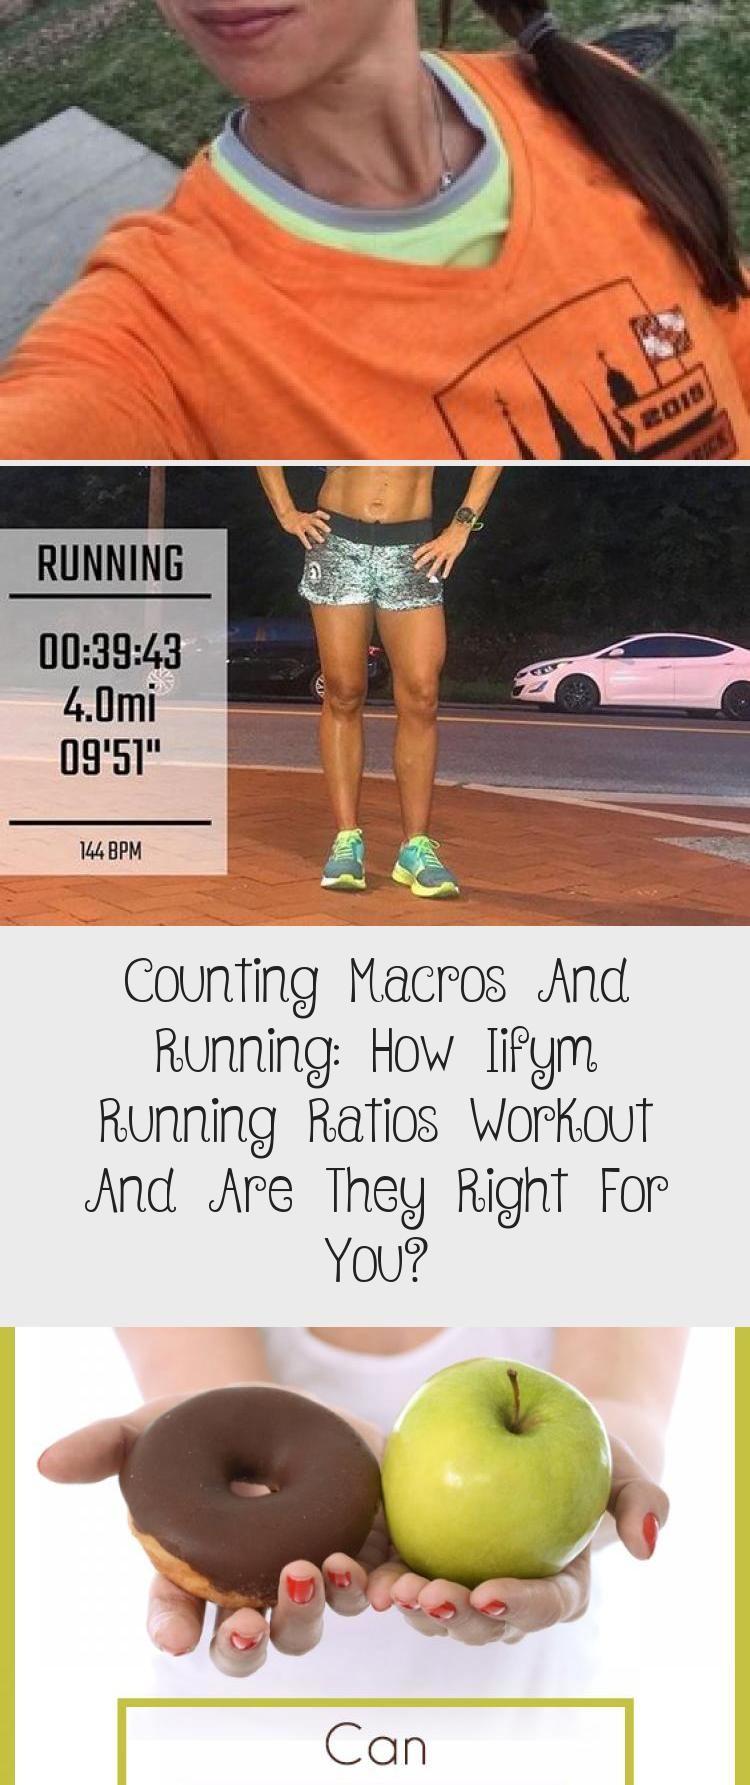 IIFYM Running meal plan example - learn more about macronutrient ratio for marathon training #iifym...